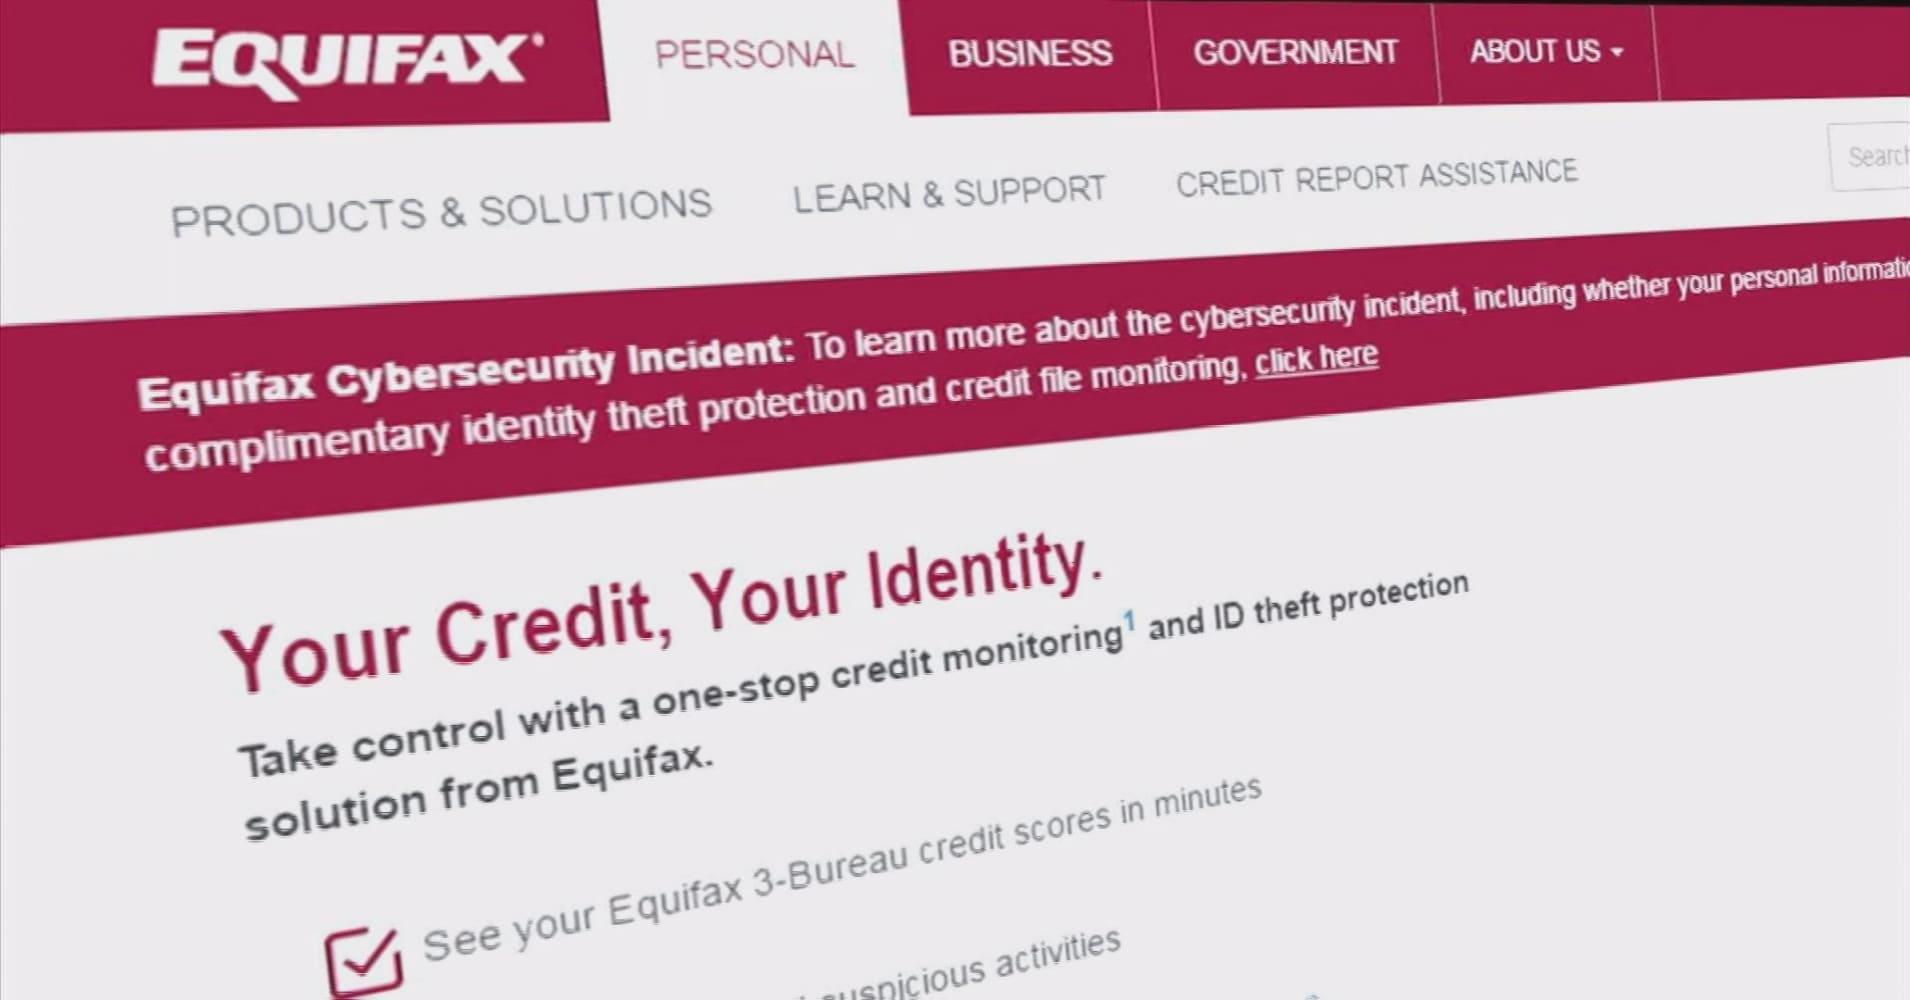 3 Reasons You Might Not Want Equifax Credit Monitoring